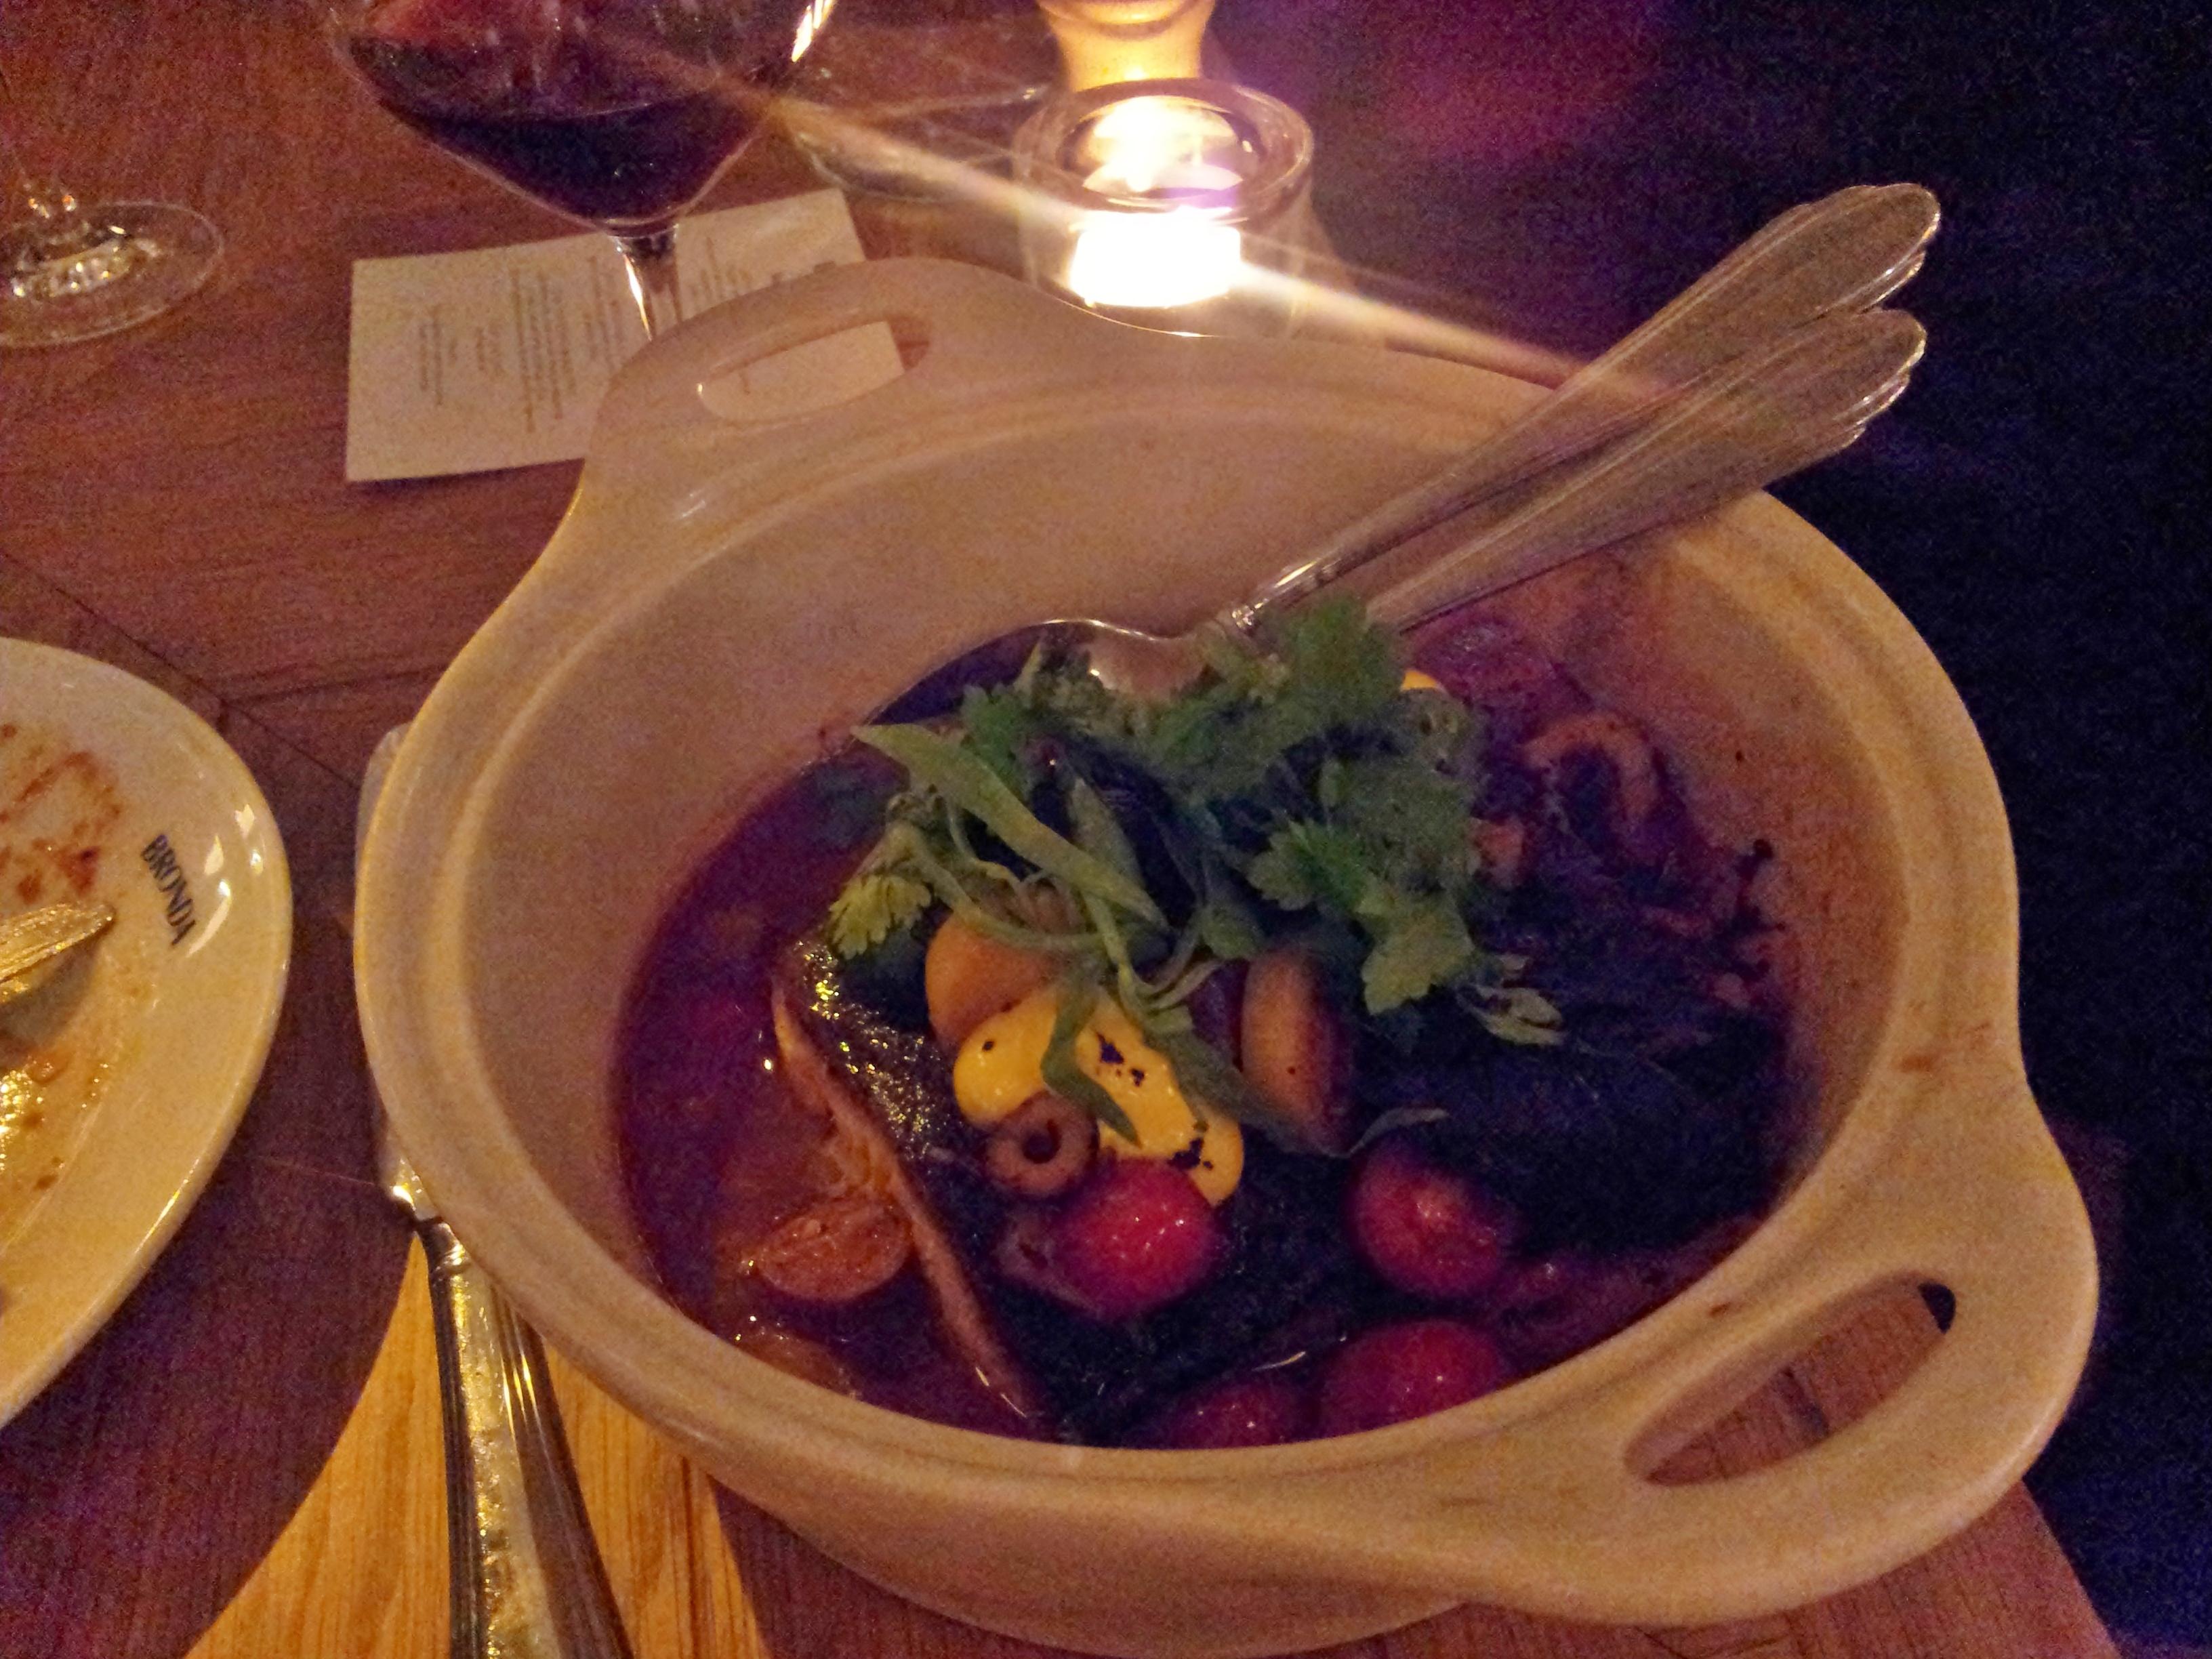 Ravintola Bronda, Helsingfors: Local fish stewed basque style & truffle polenta